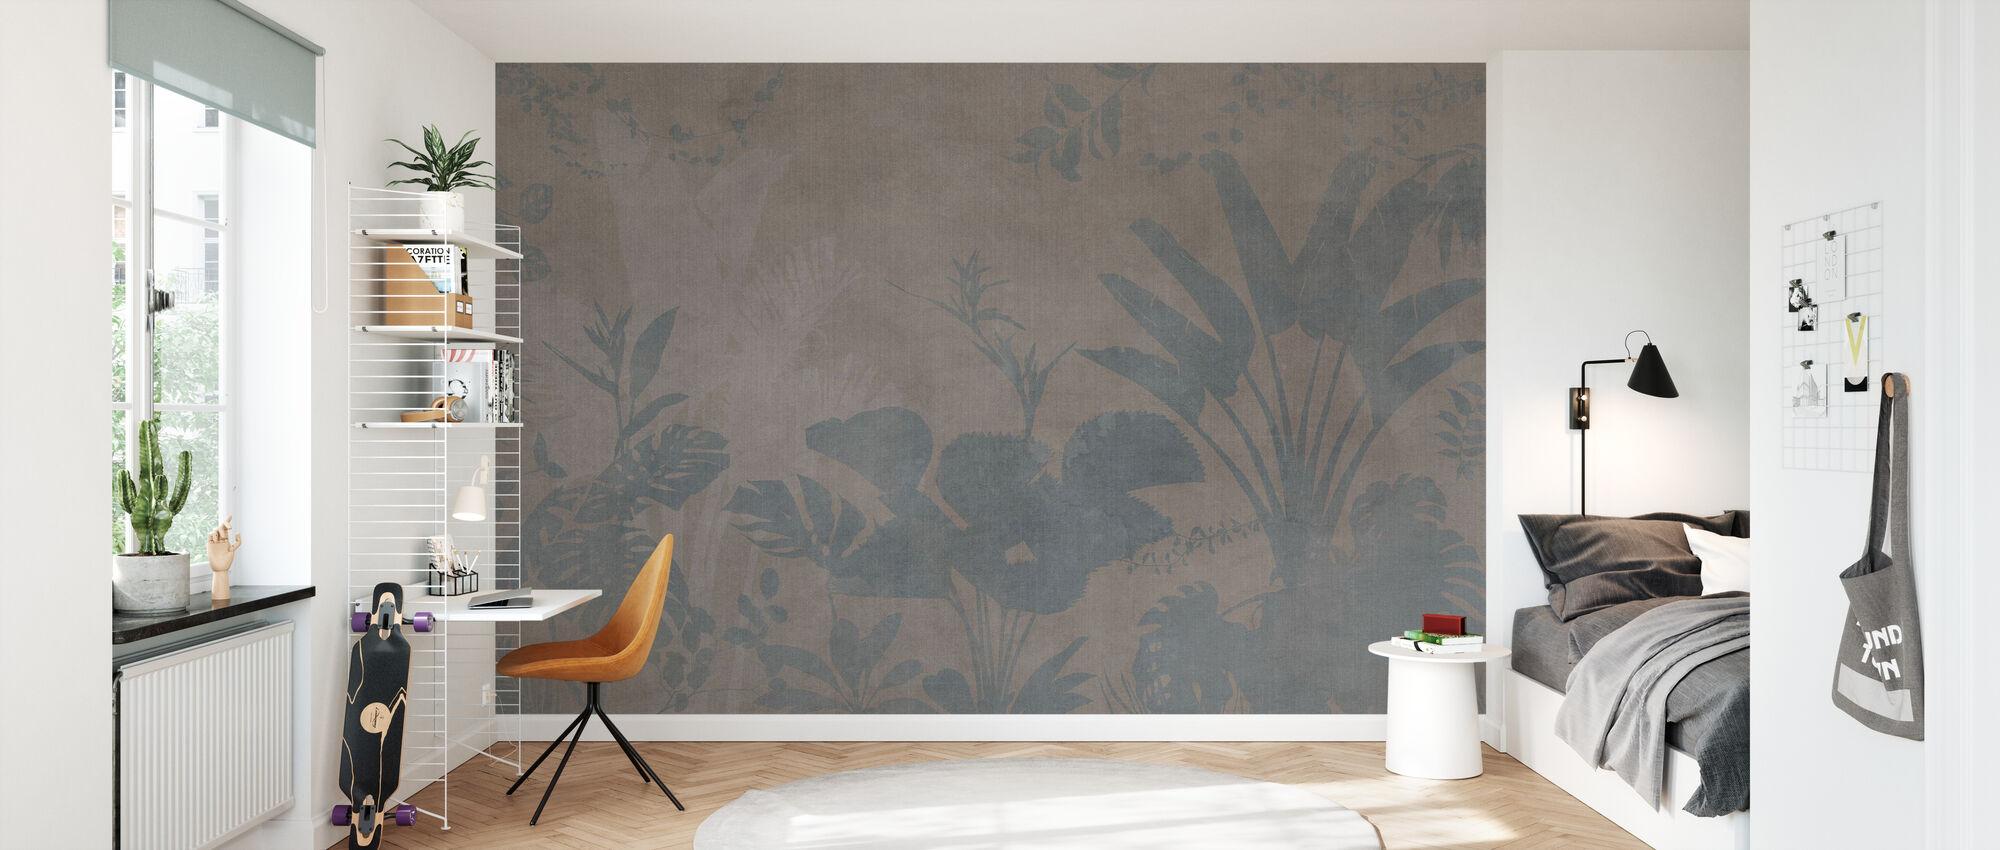 Pantanal Night - Brown - Wallpaper - Kids Room